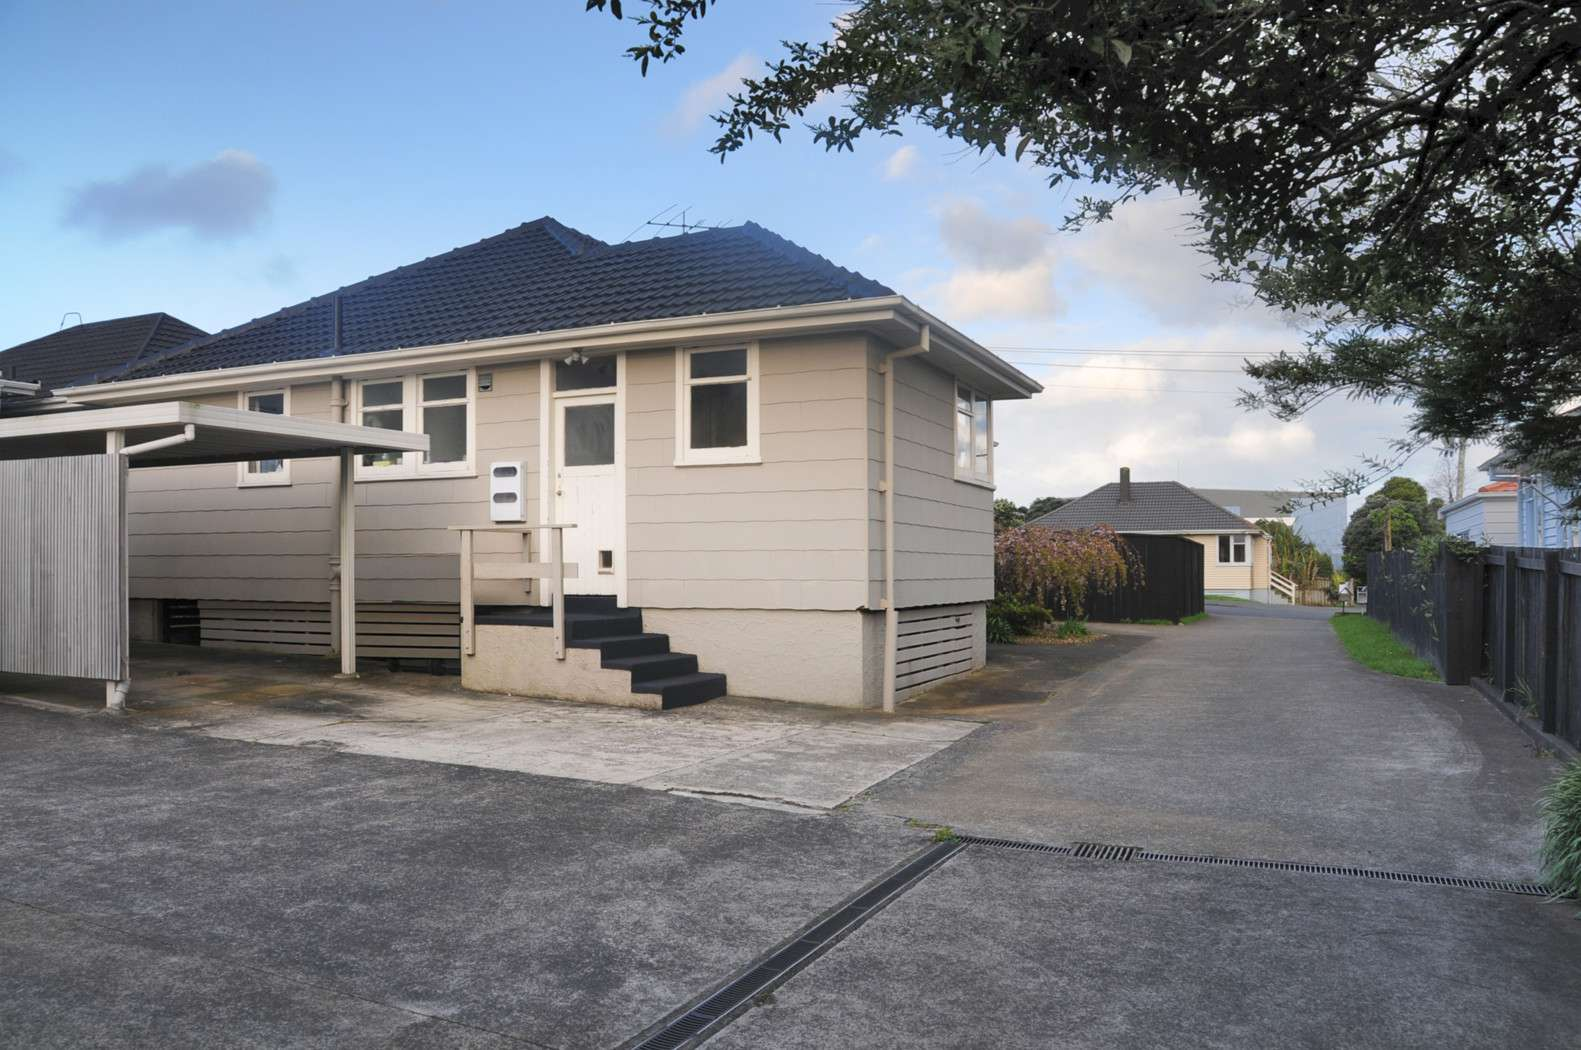 13 Lynton Road, Mt Wellington, Auckland City 1051